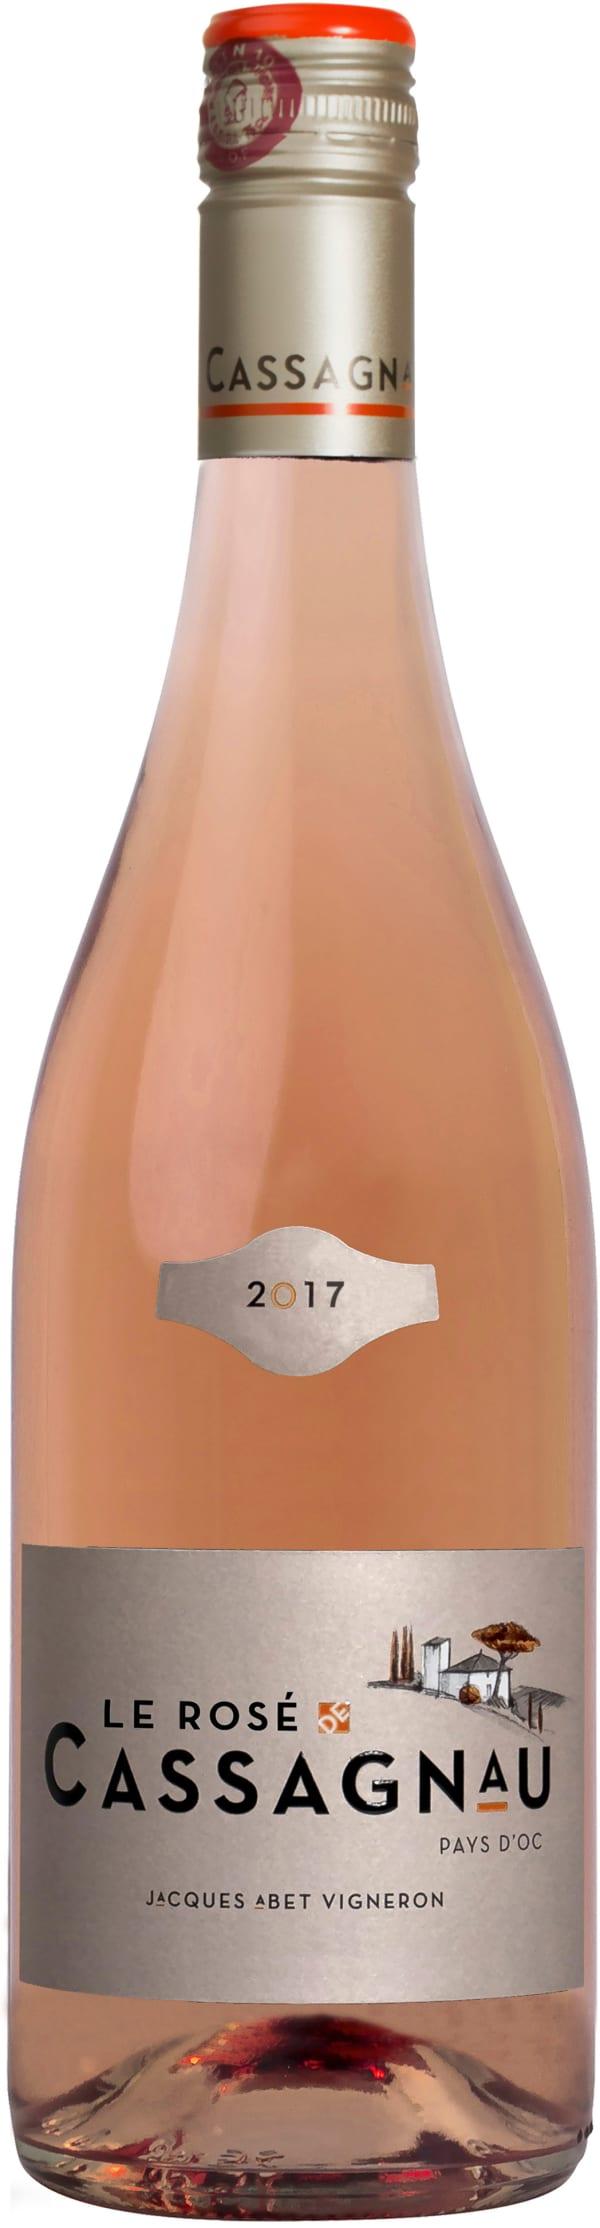 Le Rosé de Cassagnau 2017